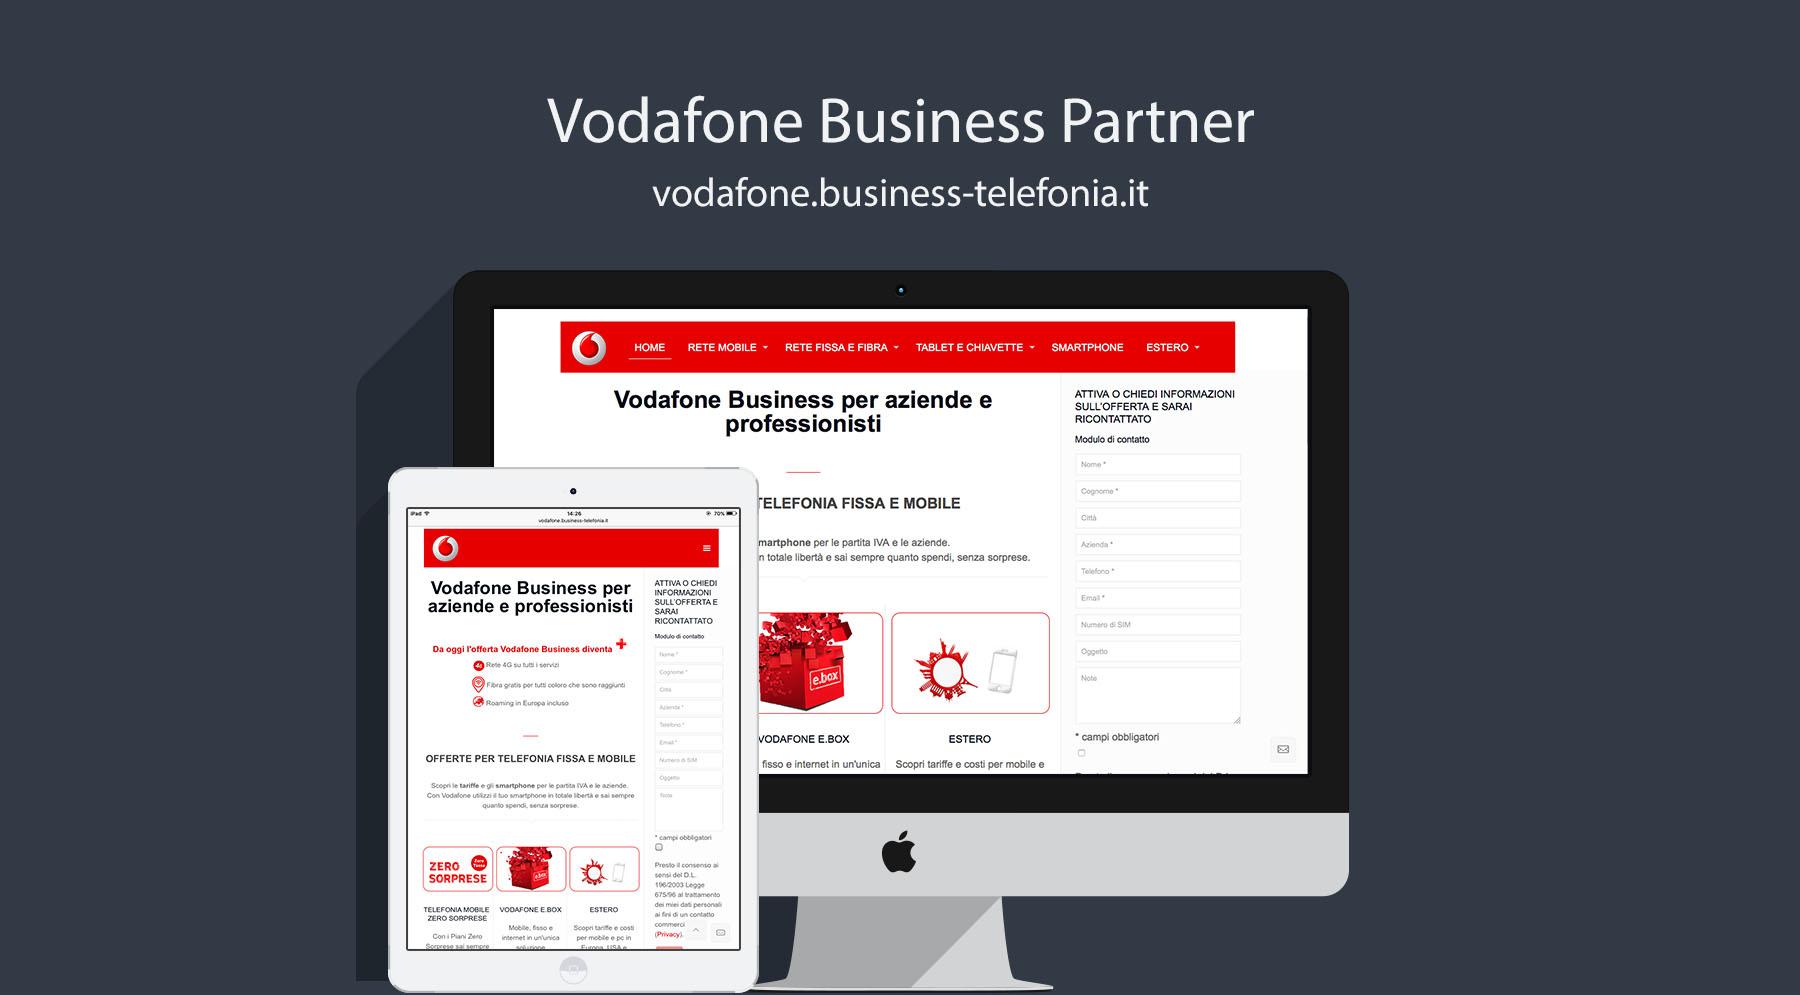 Vodafone business partner